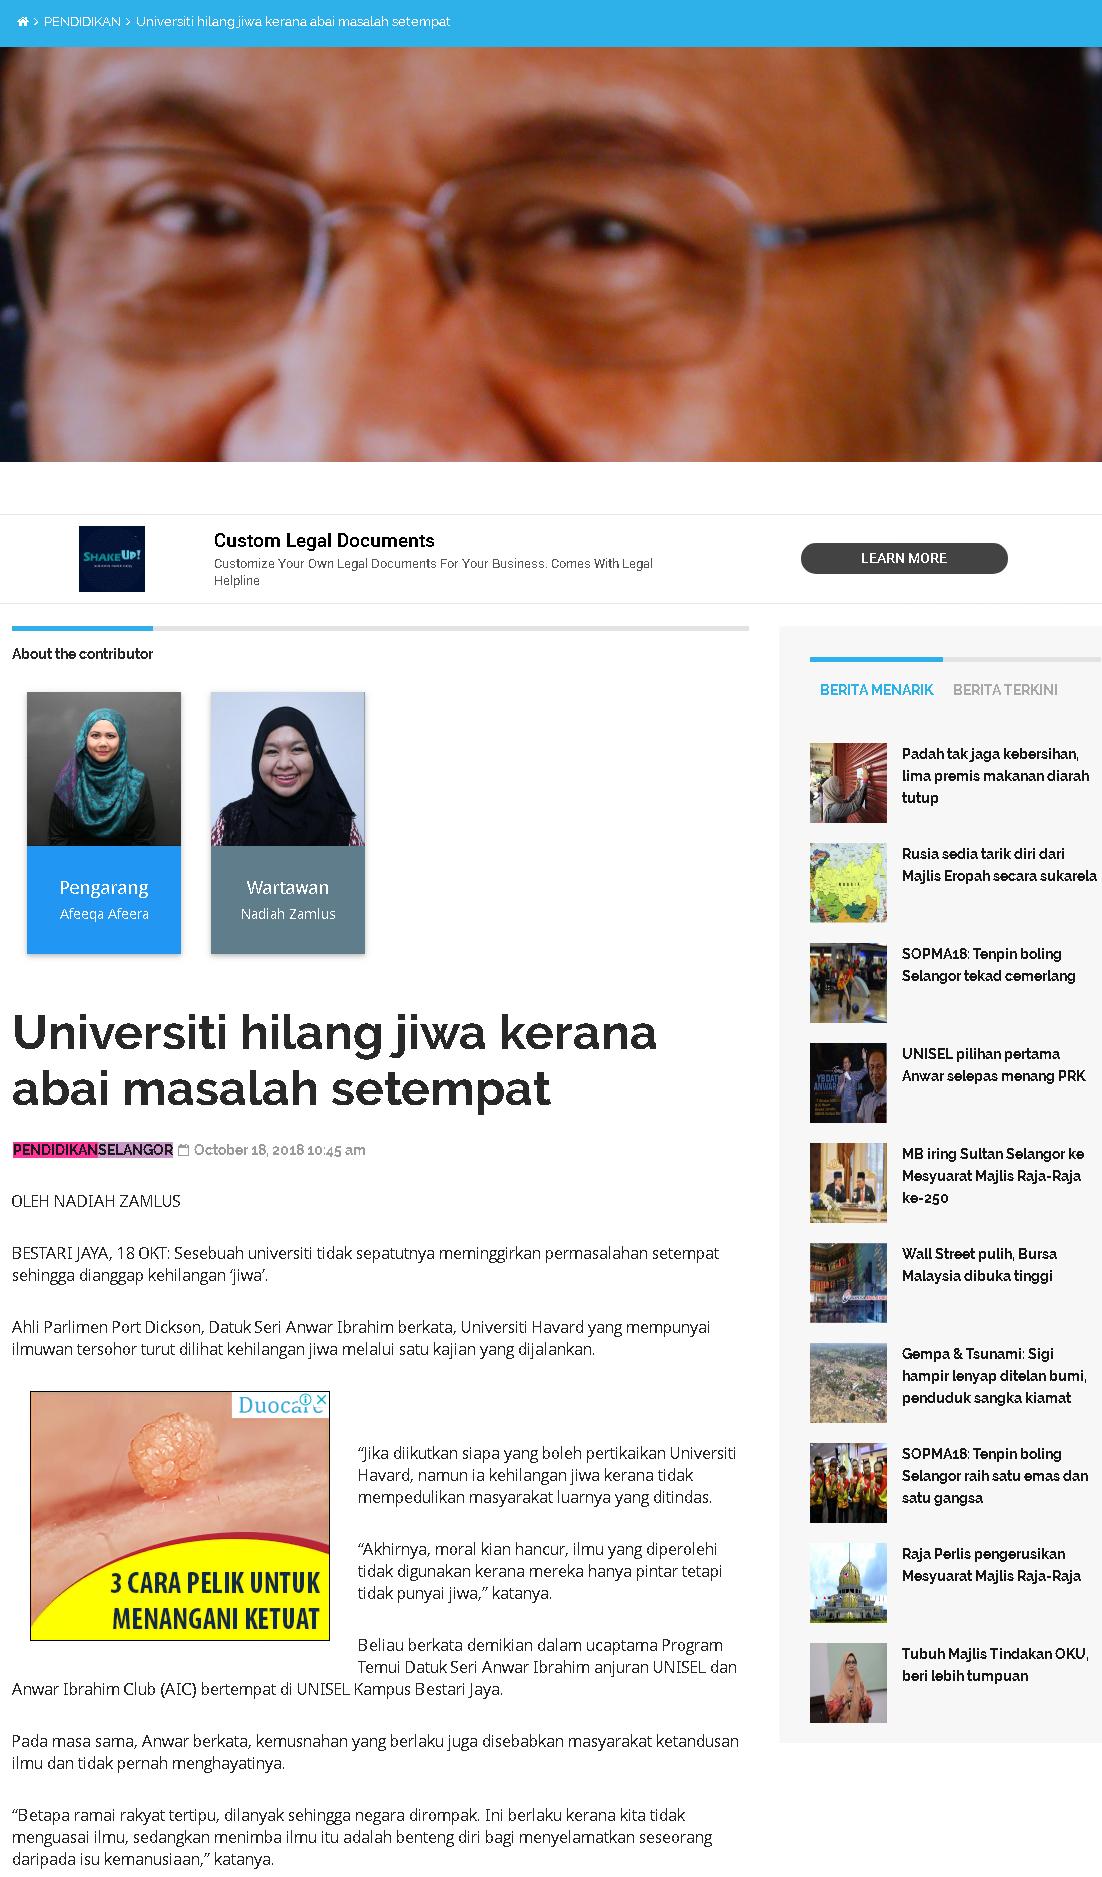 Selangor Kini Online - 18 Oktober 2018